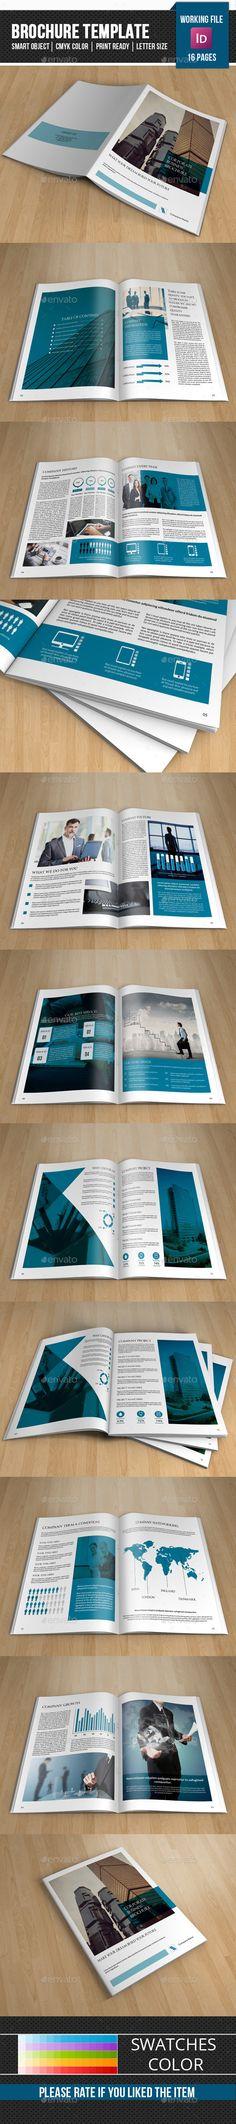 Corporate Bifold Brochure Template #design Download: http://graphicriver.net/item/corporate-bifold-brochurev318/13385038?ref=ksioks